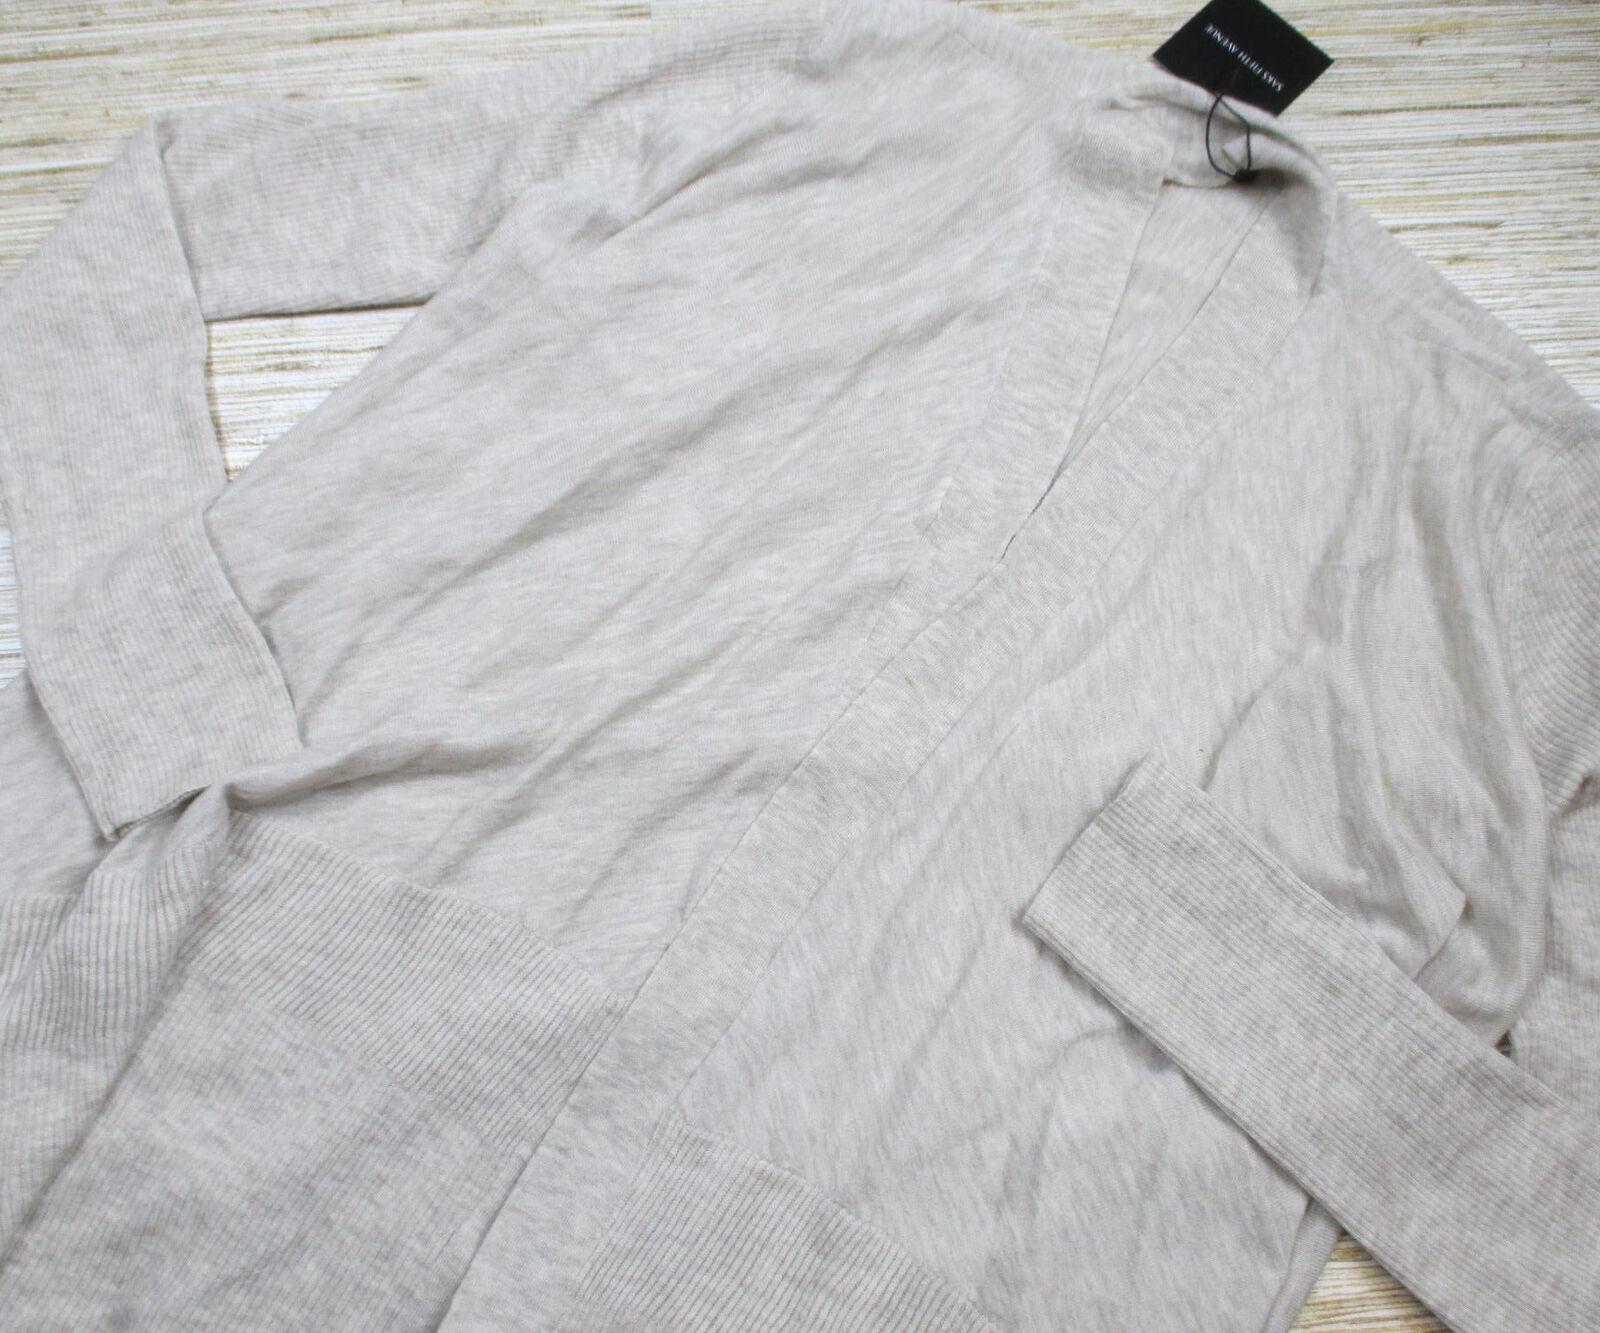 BB15 Saks Fifth Avenue wool blend open front cardigan sweater OATMEAL size S